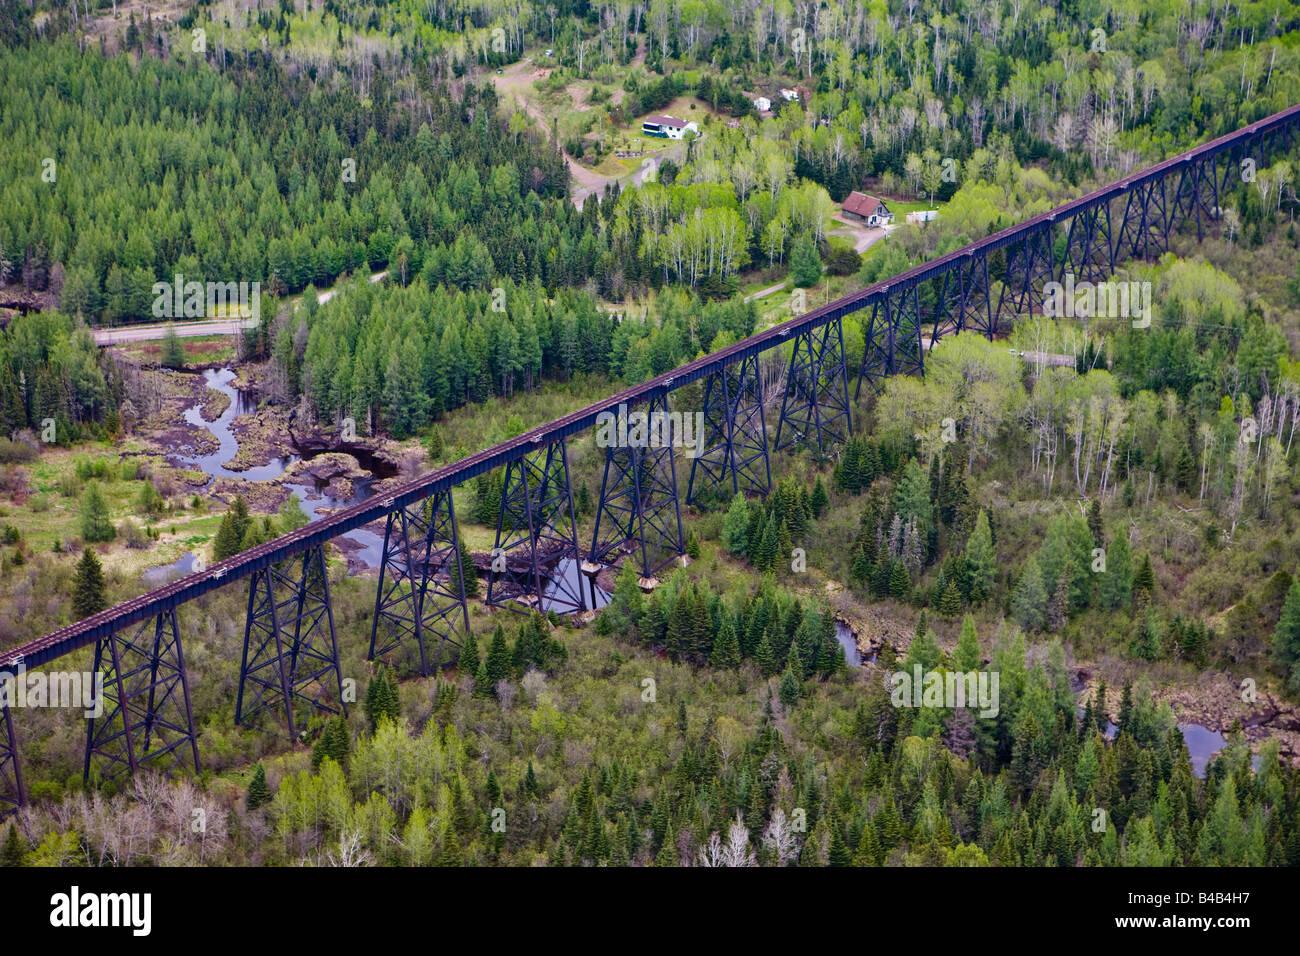 High Level rail bridge near near the town of Ouimet in Ontario, Canada. - Stock Image